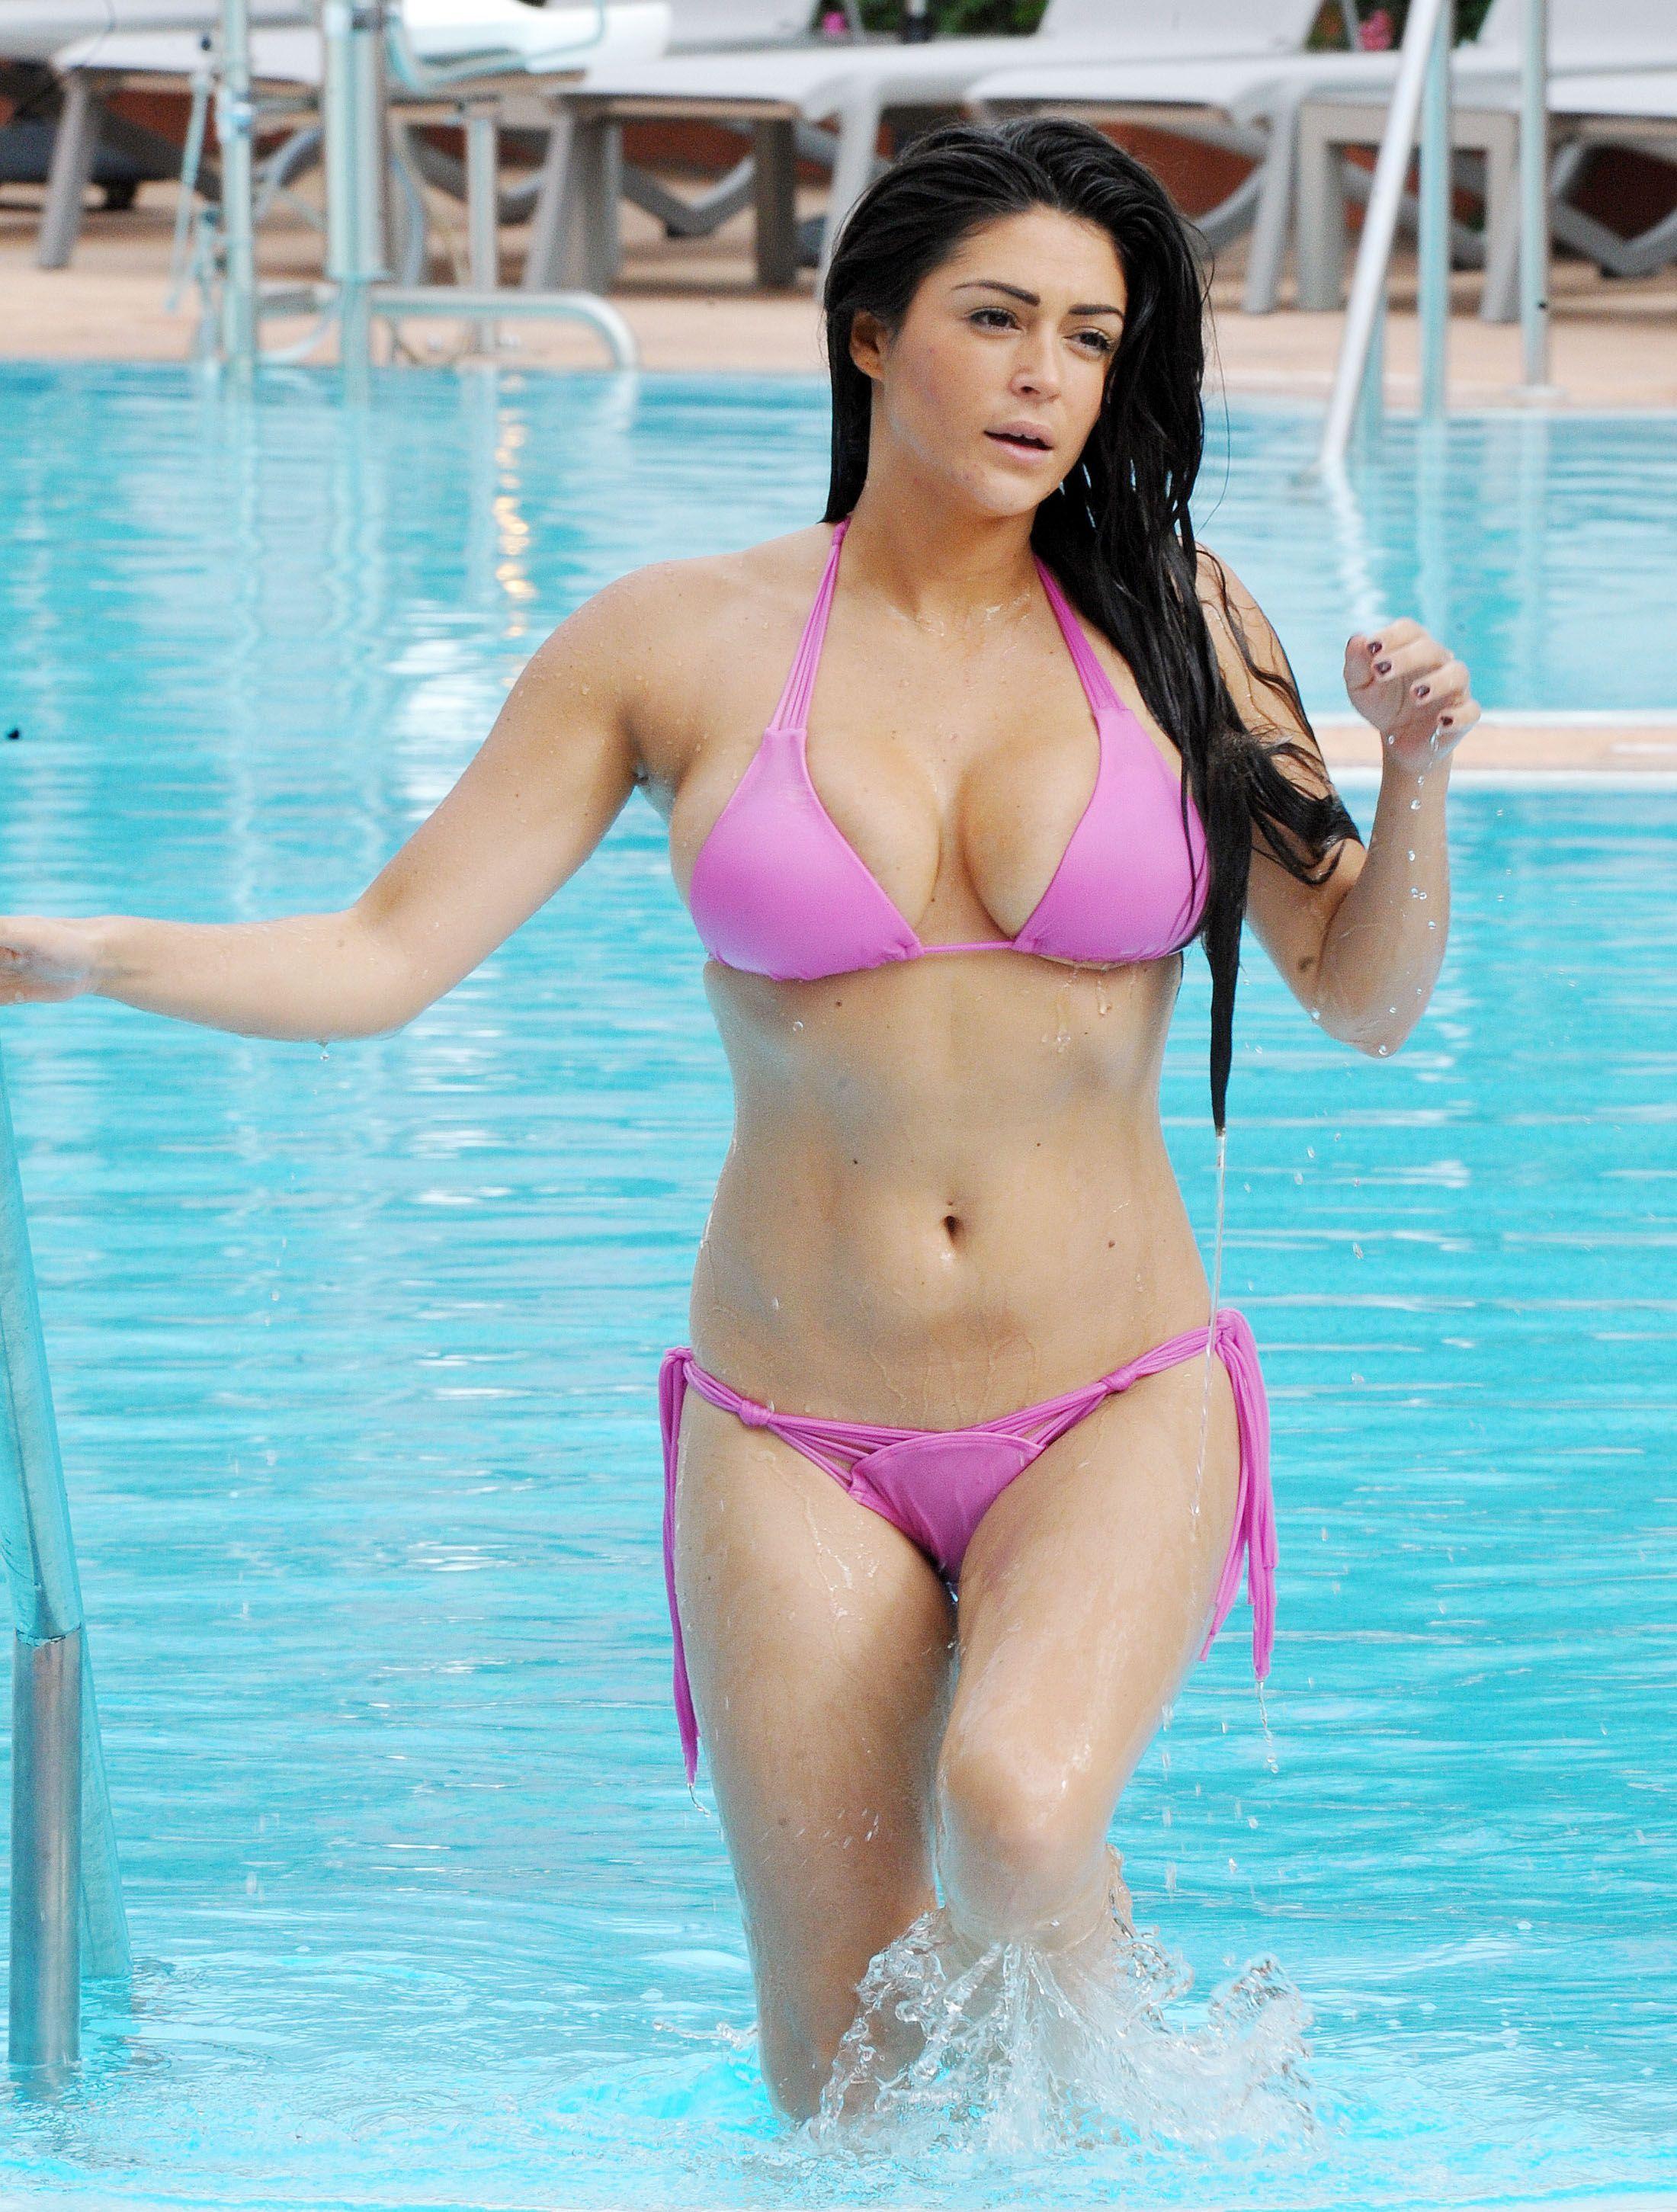 Bikini Nikki Grahame nude (68 photos), Topless, Is a cute, Selfie, in bikini 2015